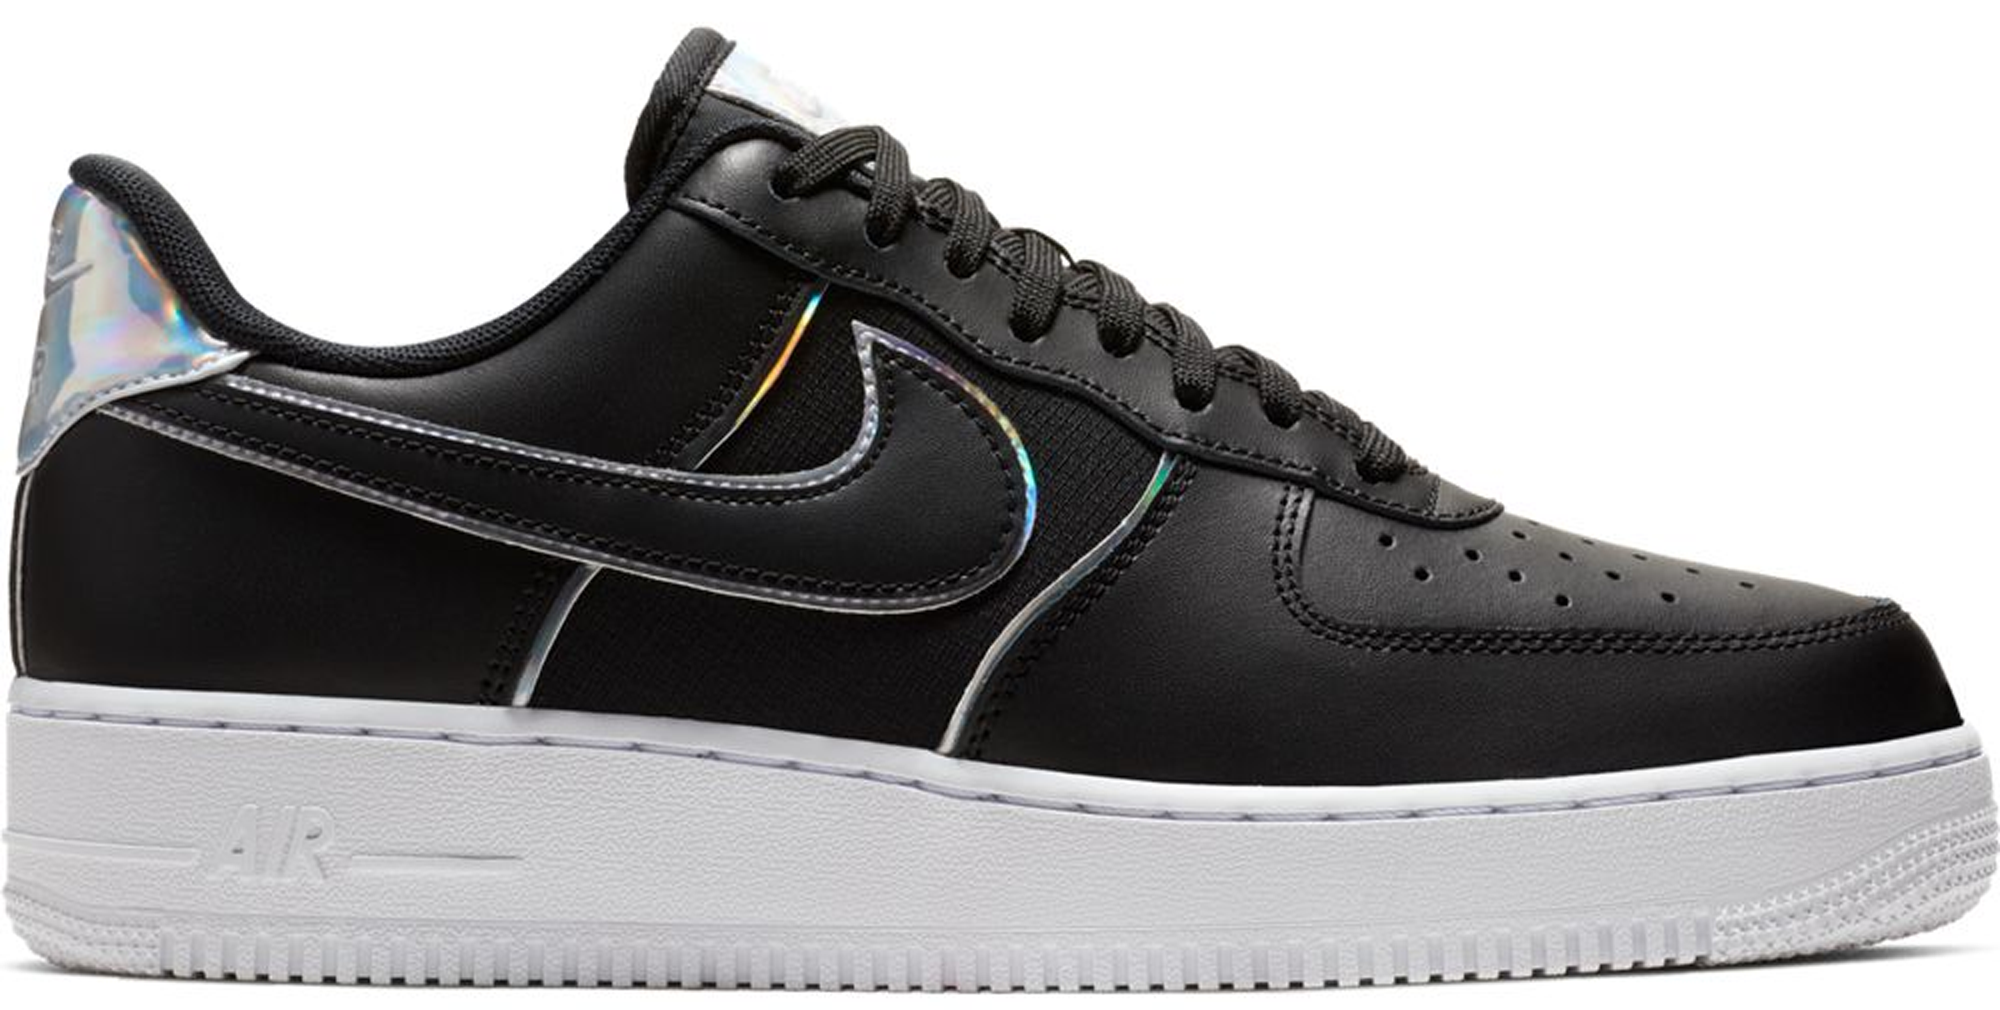 Nike Air Force 1 Low Black Iridescent